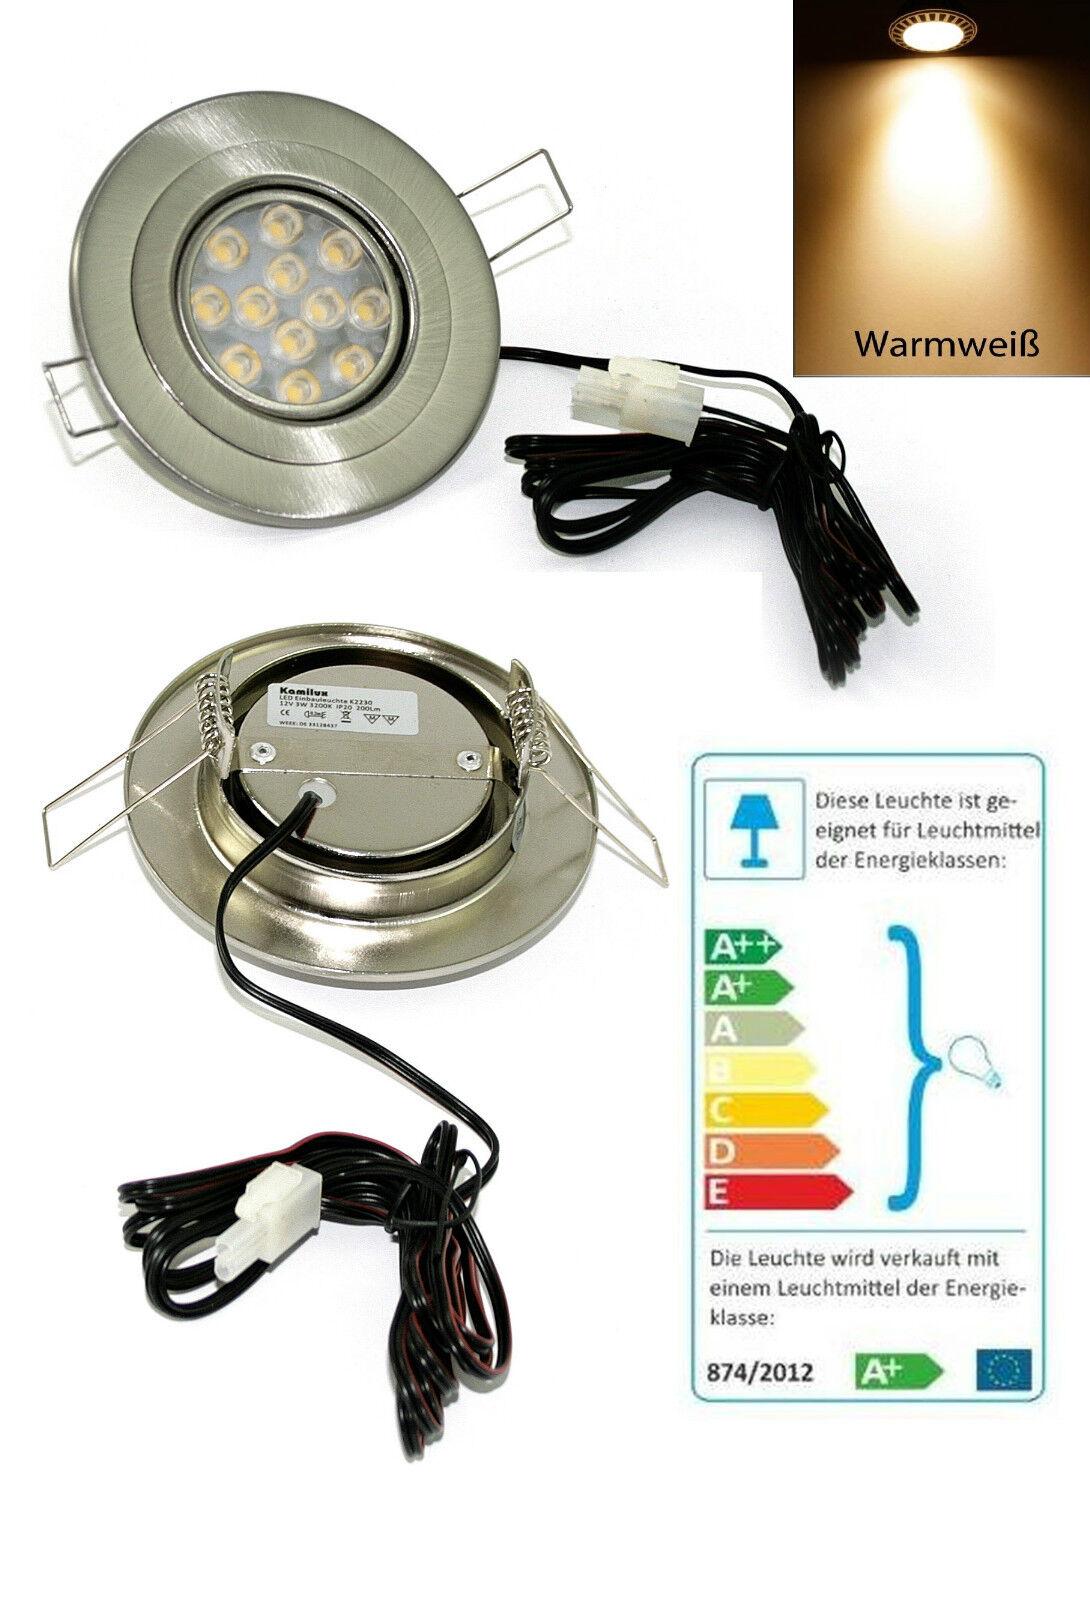 LED Einbaurahmen 12 Volt Eli 3 Watt = 25 Watt Warmweiss 1,5m Zuleitung